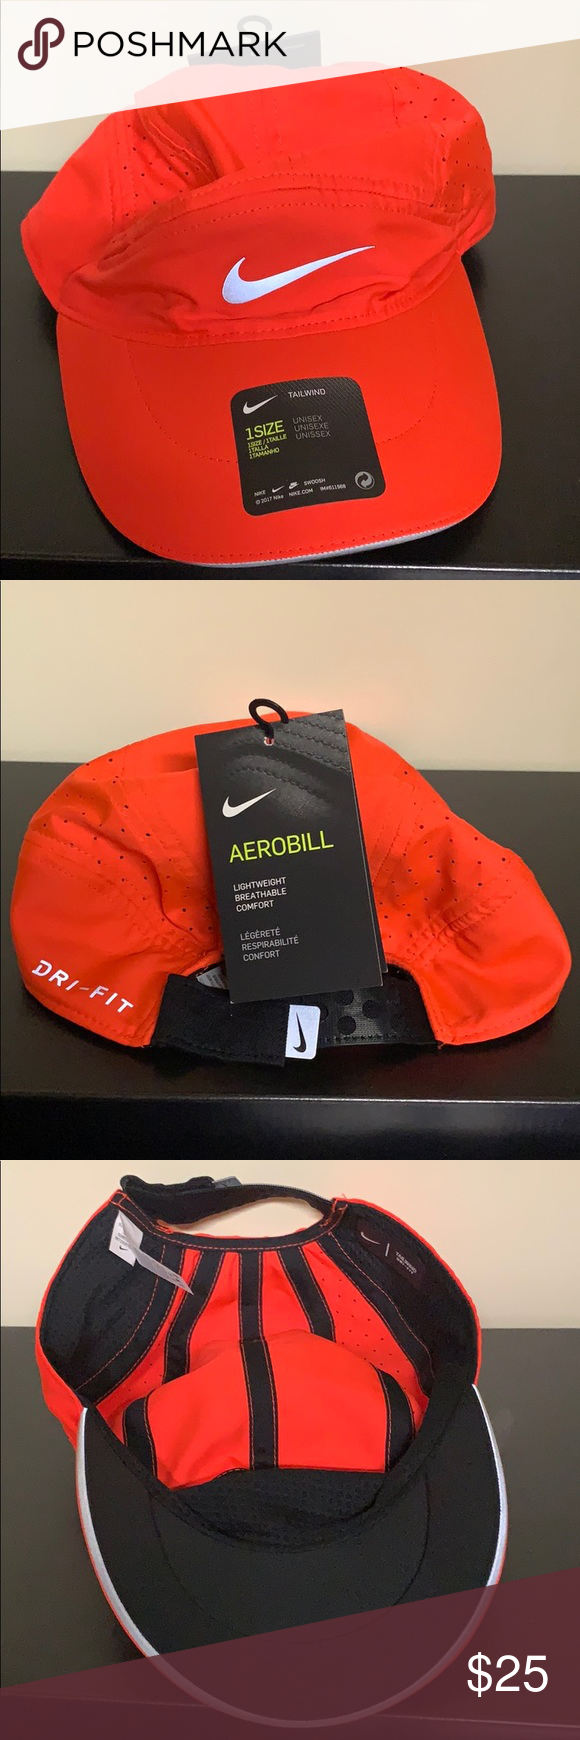 New Unisex Nike Featherlight Aerobill Tailwind Hat Nike Accessories Nike Tailwind Nike